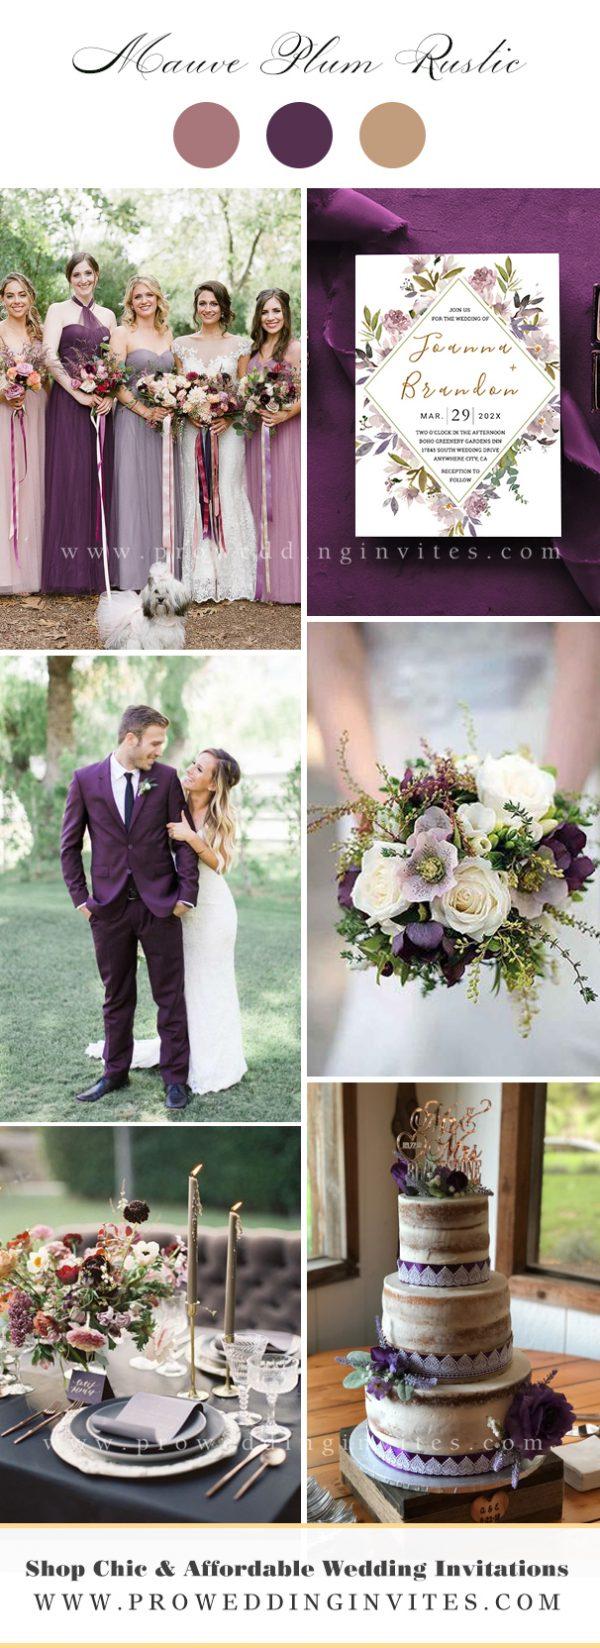 Mauve, plum green rustic wedding ideasn Wedding Ideas Wedding Wedding Color Ideas with Matching Invitations